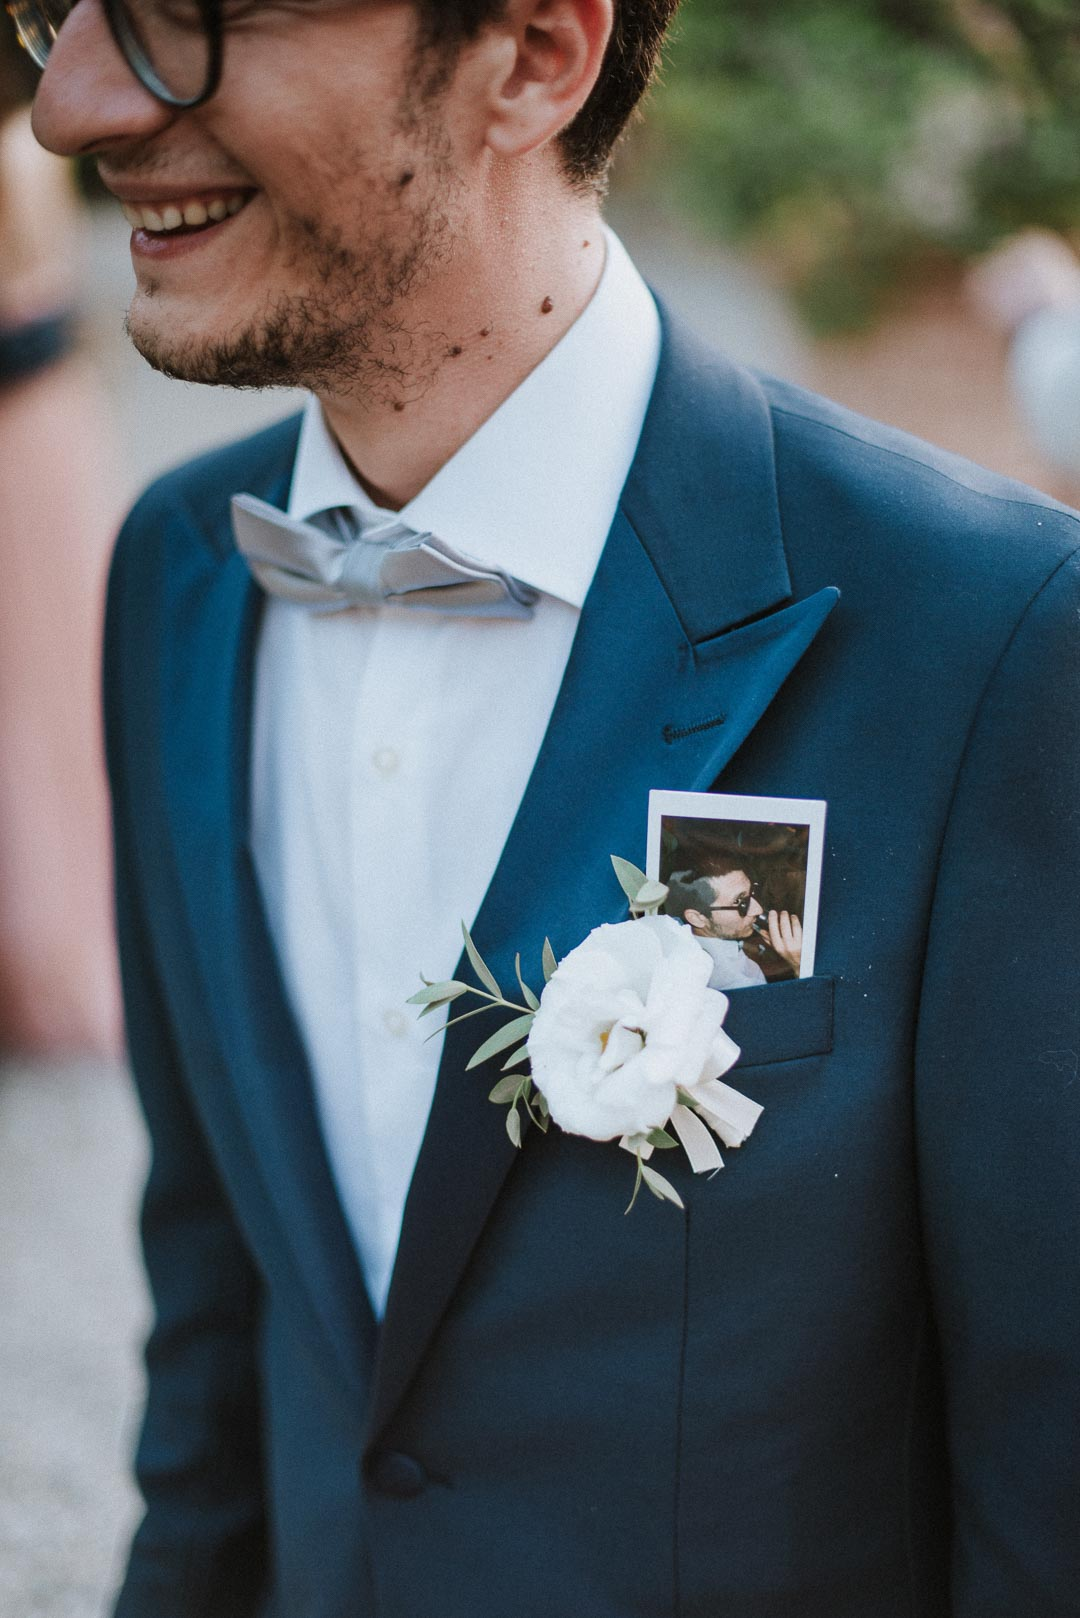 wedding-photographer-destination-fineart-bespoke-reportage-tuscany-villascorzi-vivianeizzo-spazio46-147